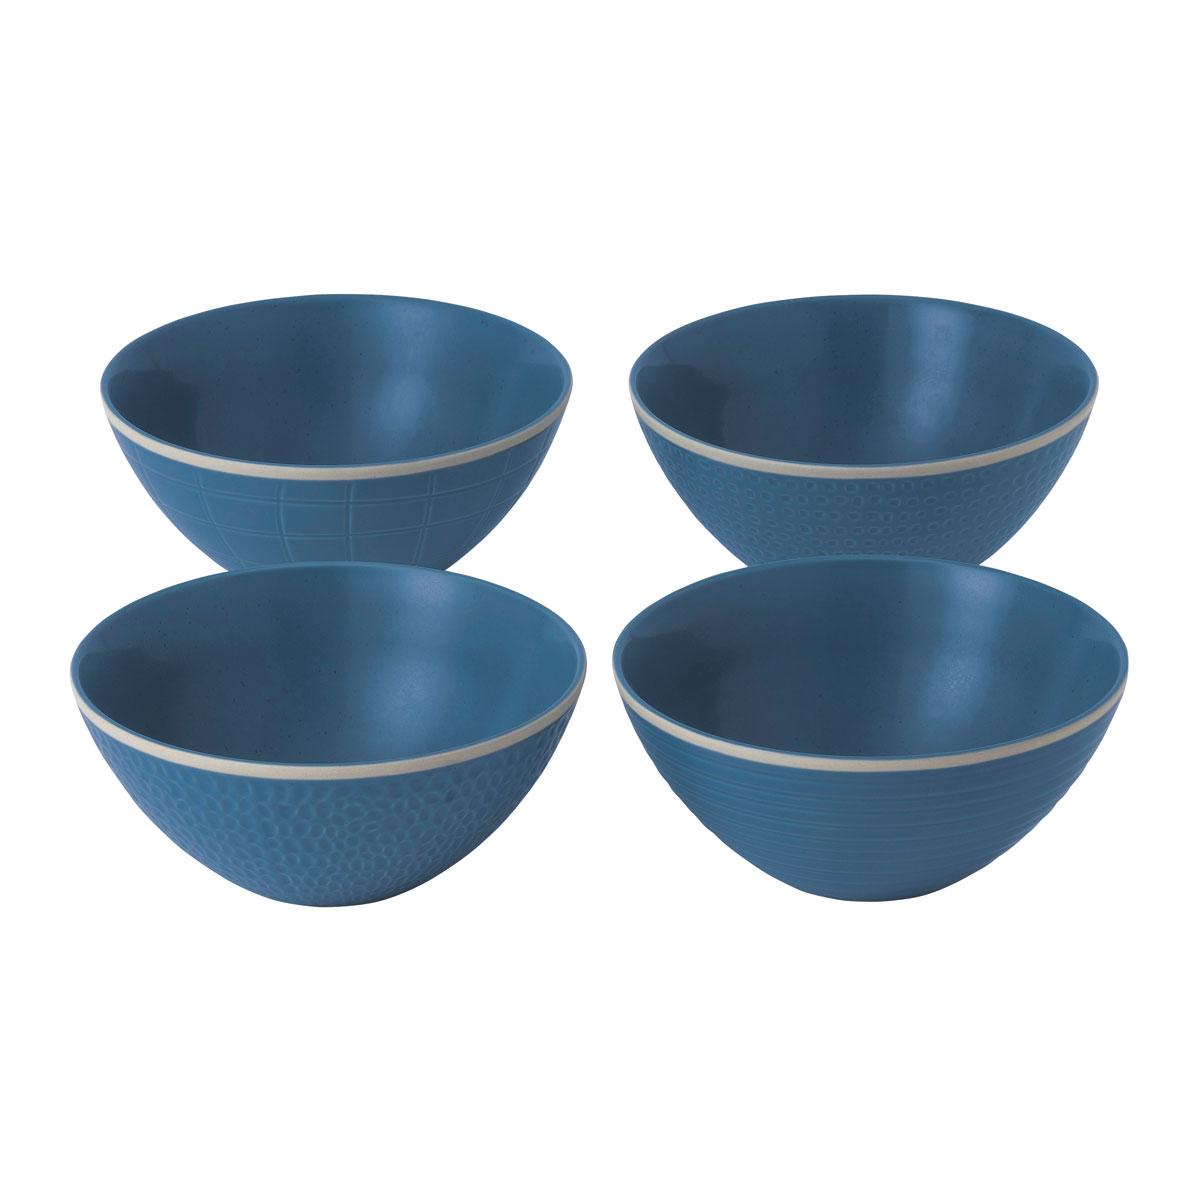 "Royal Doulton Gordon Ramsay Maze Grill Blue Bowl 6"" Set of 4 Mixed"